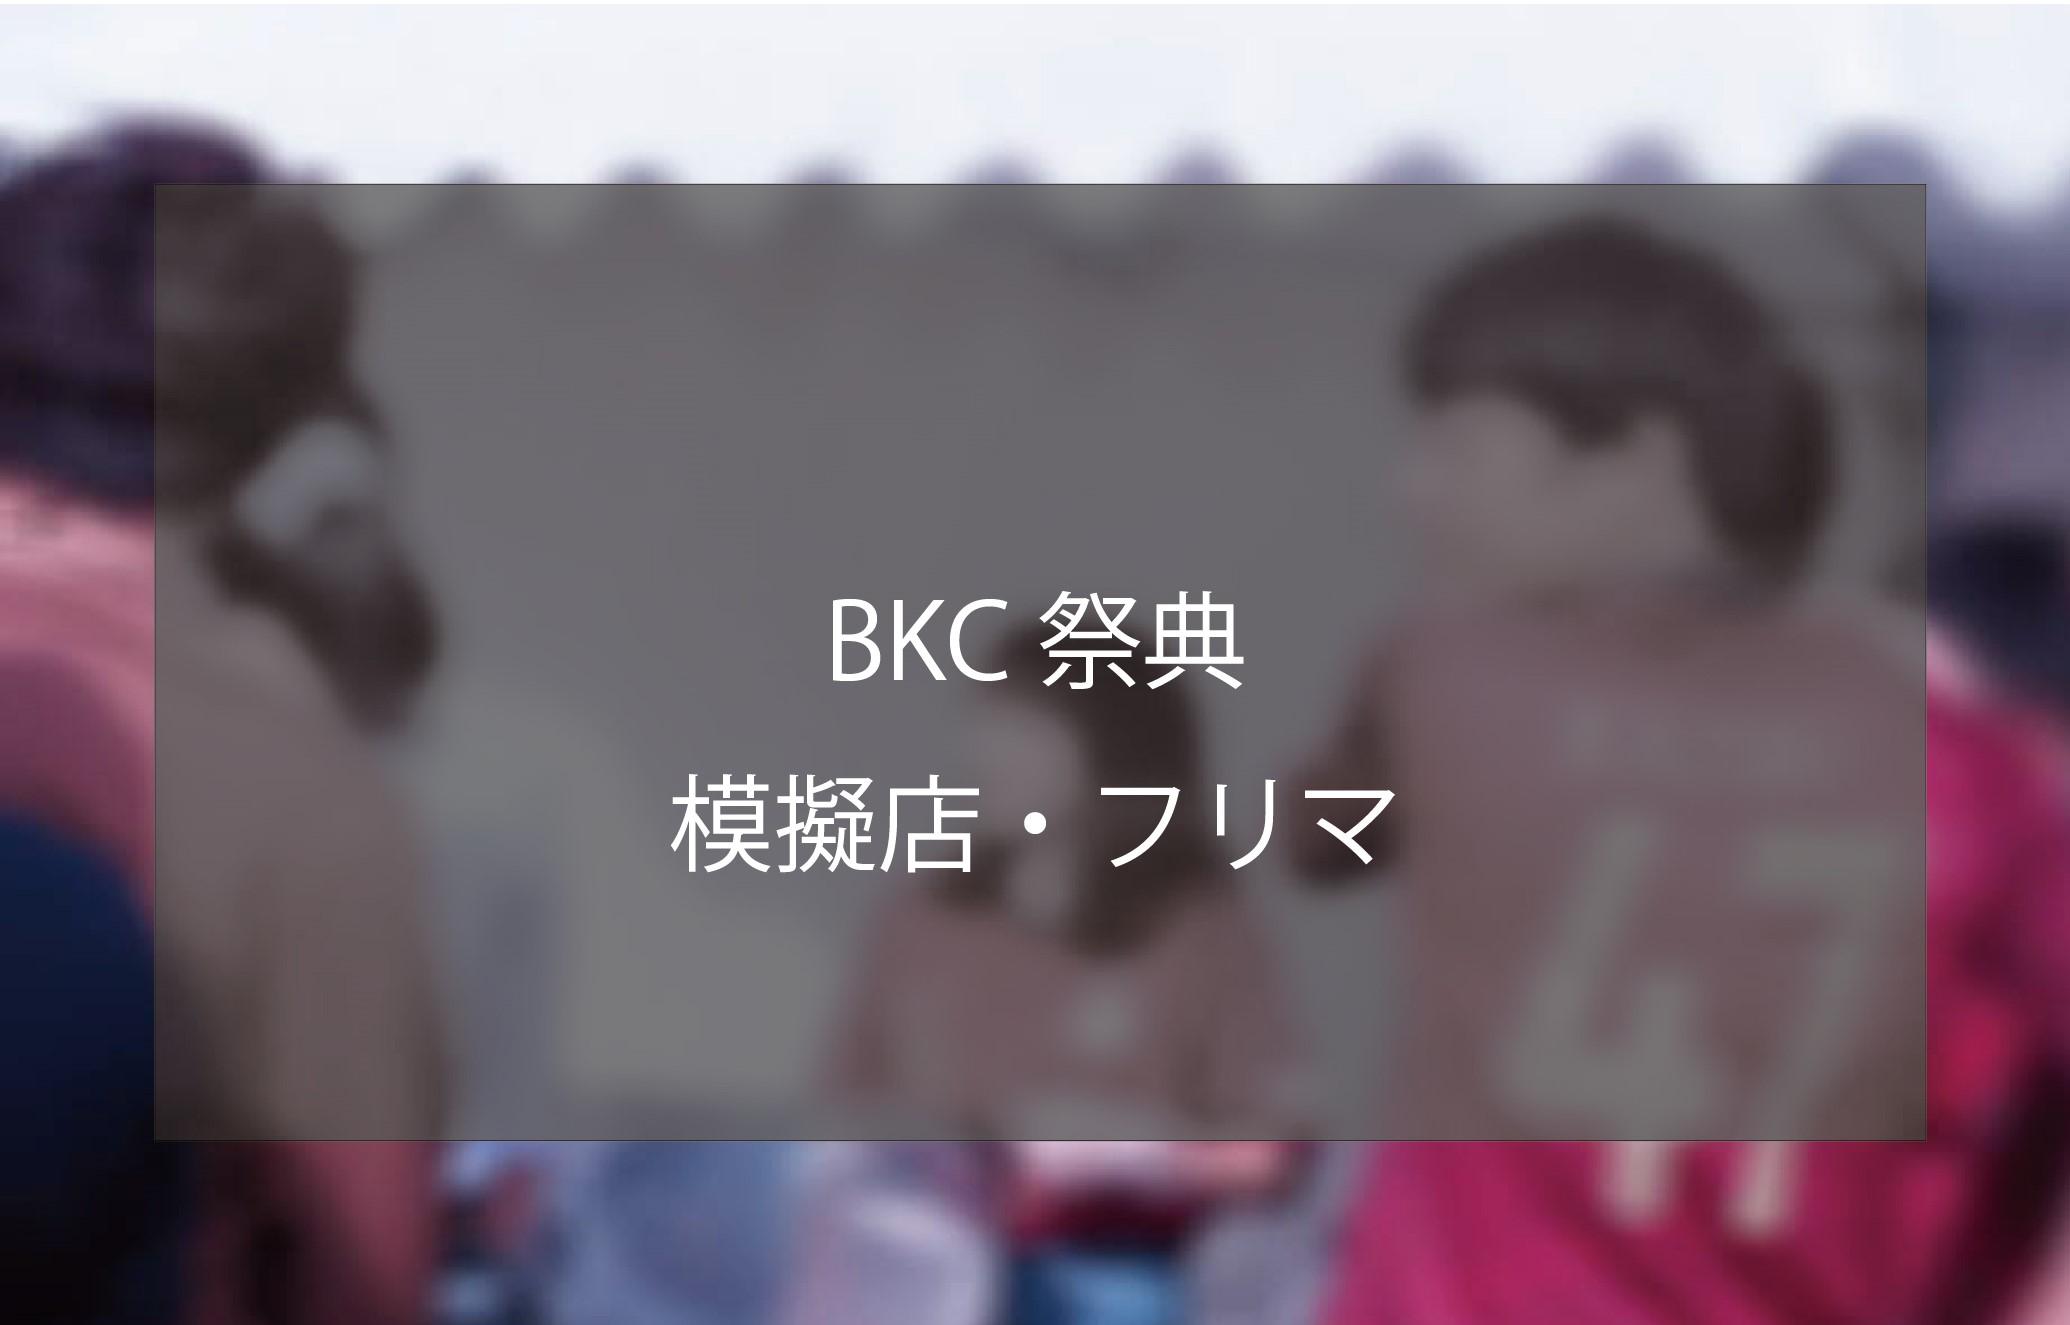 BKC 模擬店・フリーマーケット企画